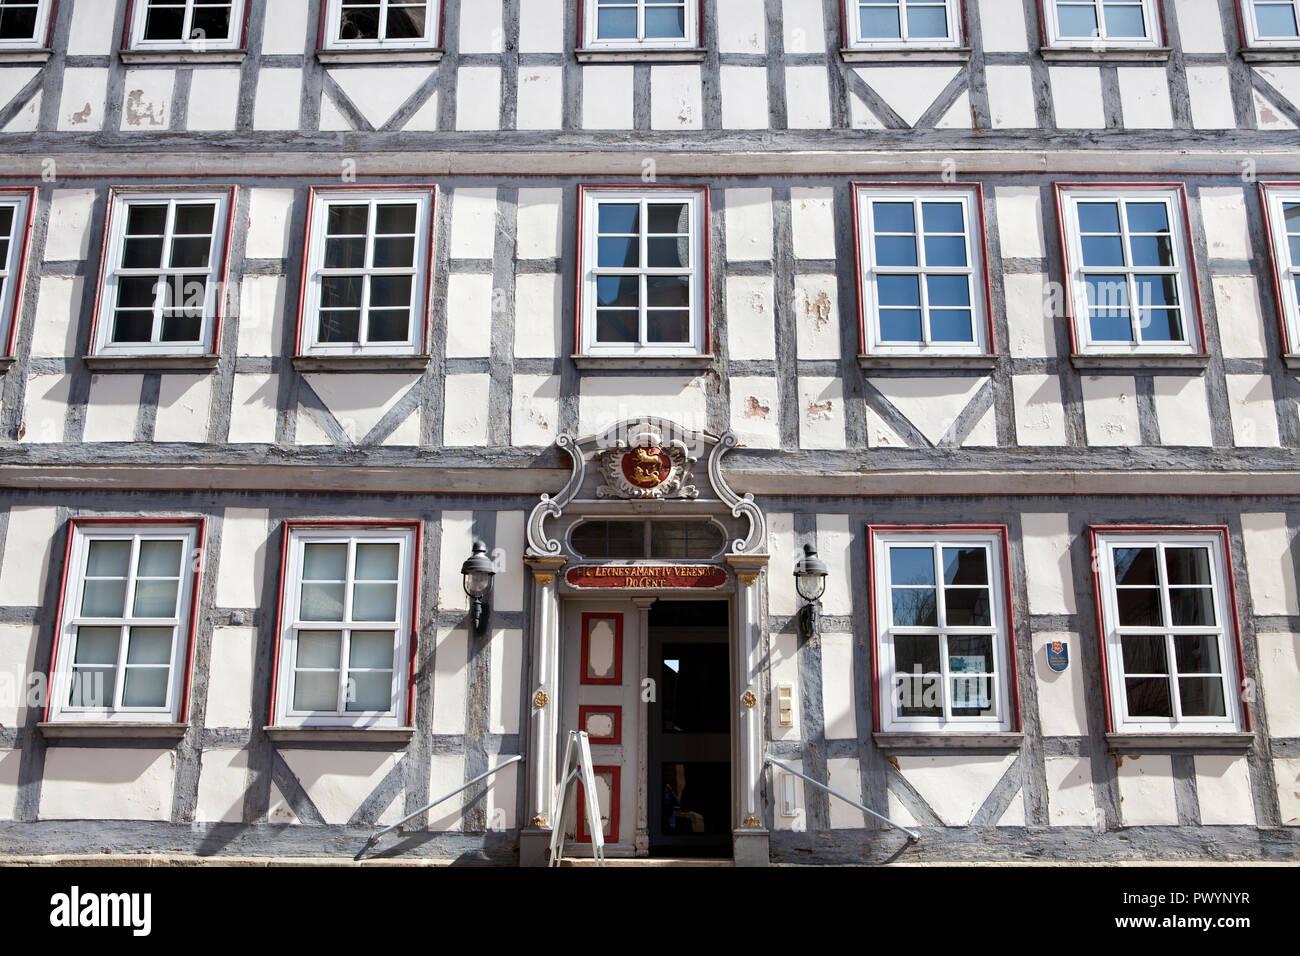 Municipal museum, former Catholic boys' school, Duderstadt, Lower Saxony, Germany, Europe - Stock Image